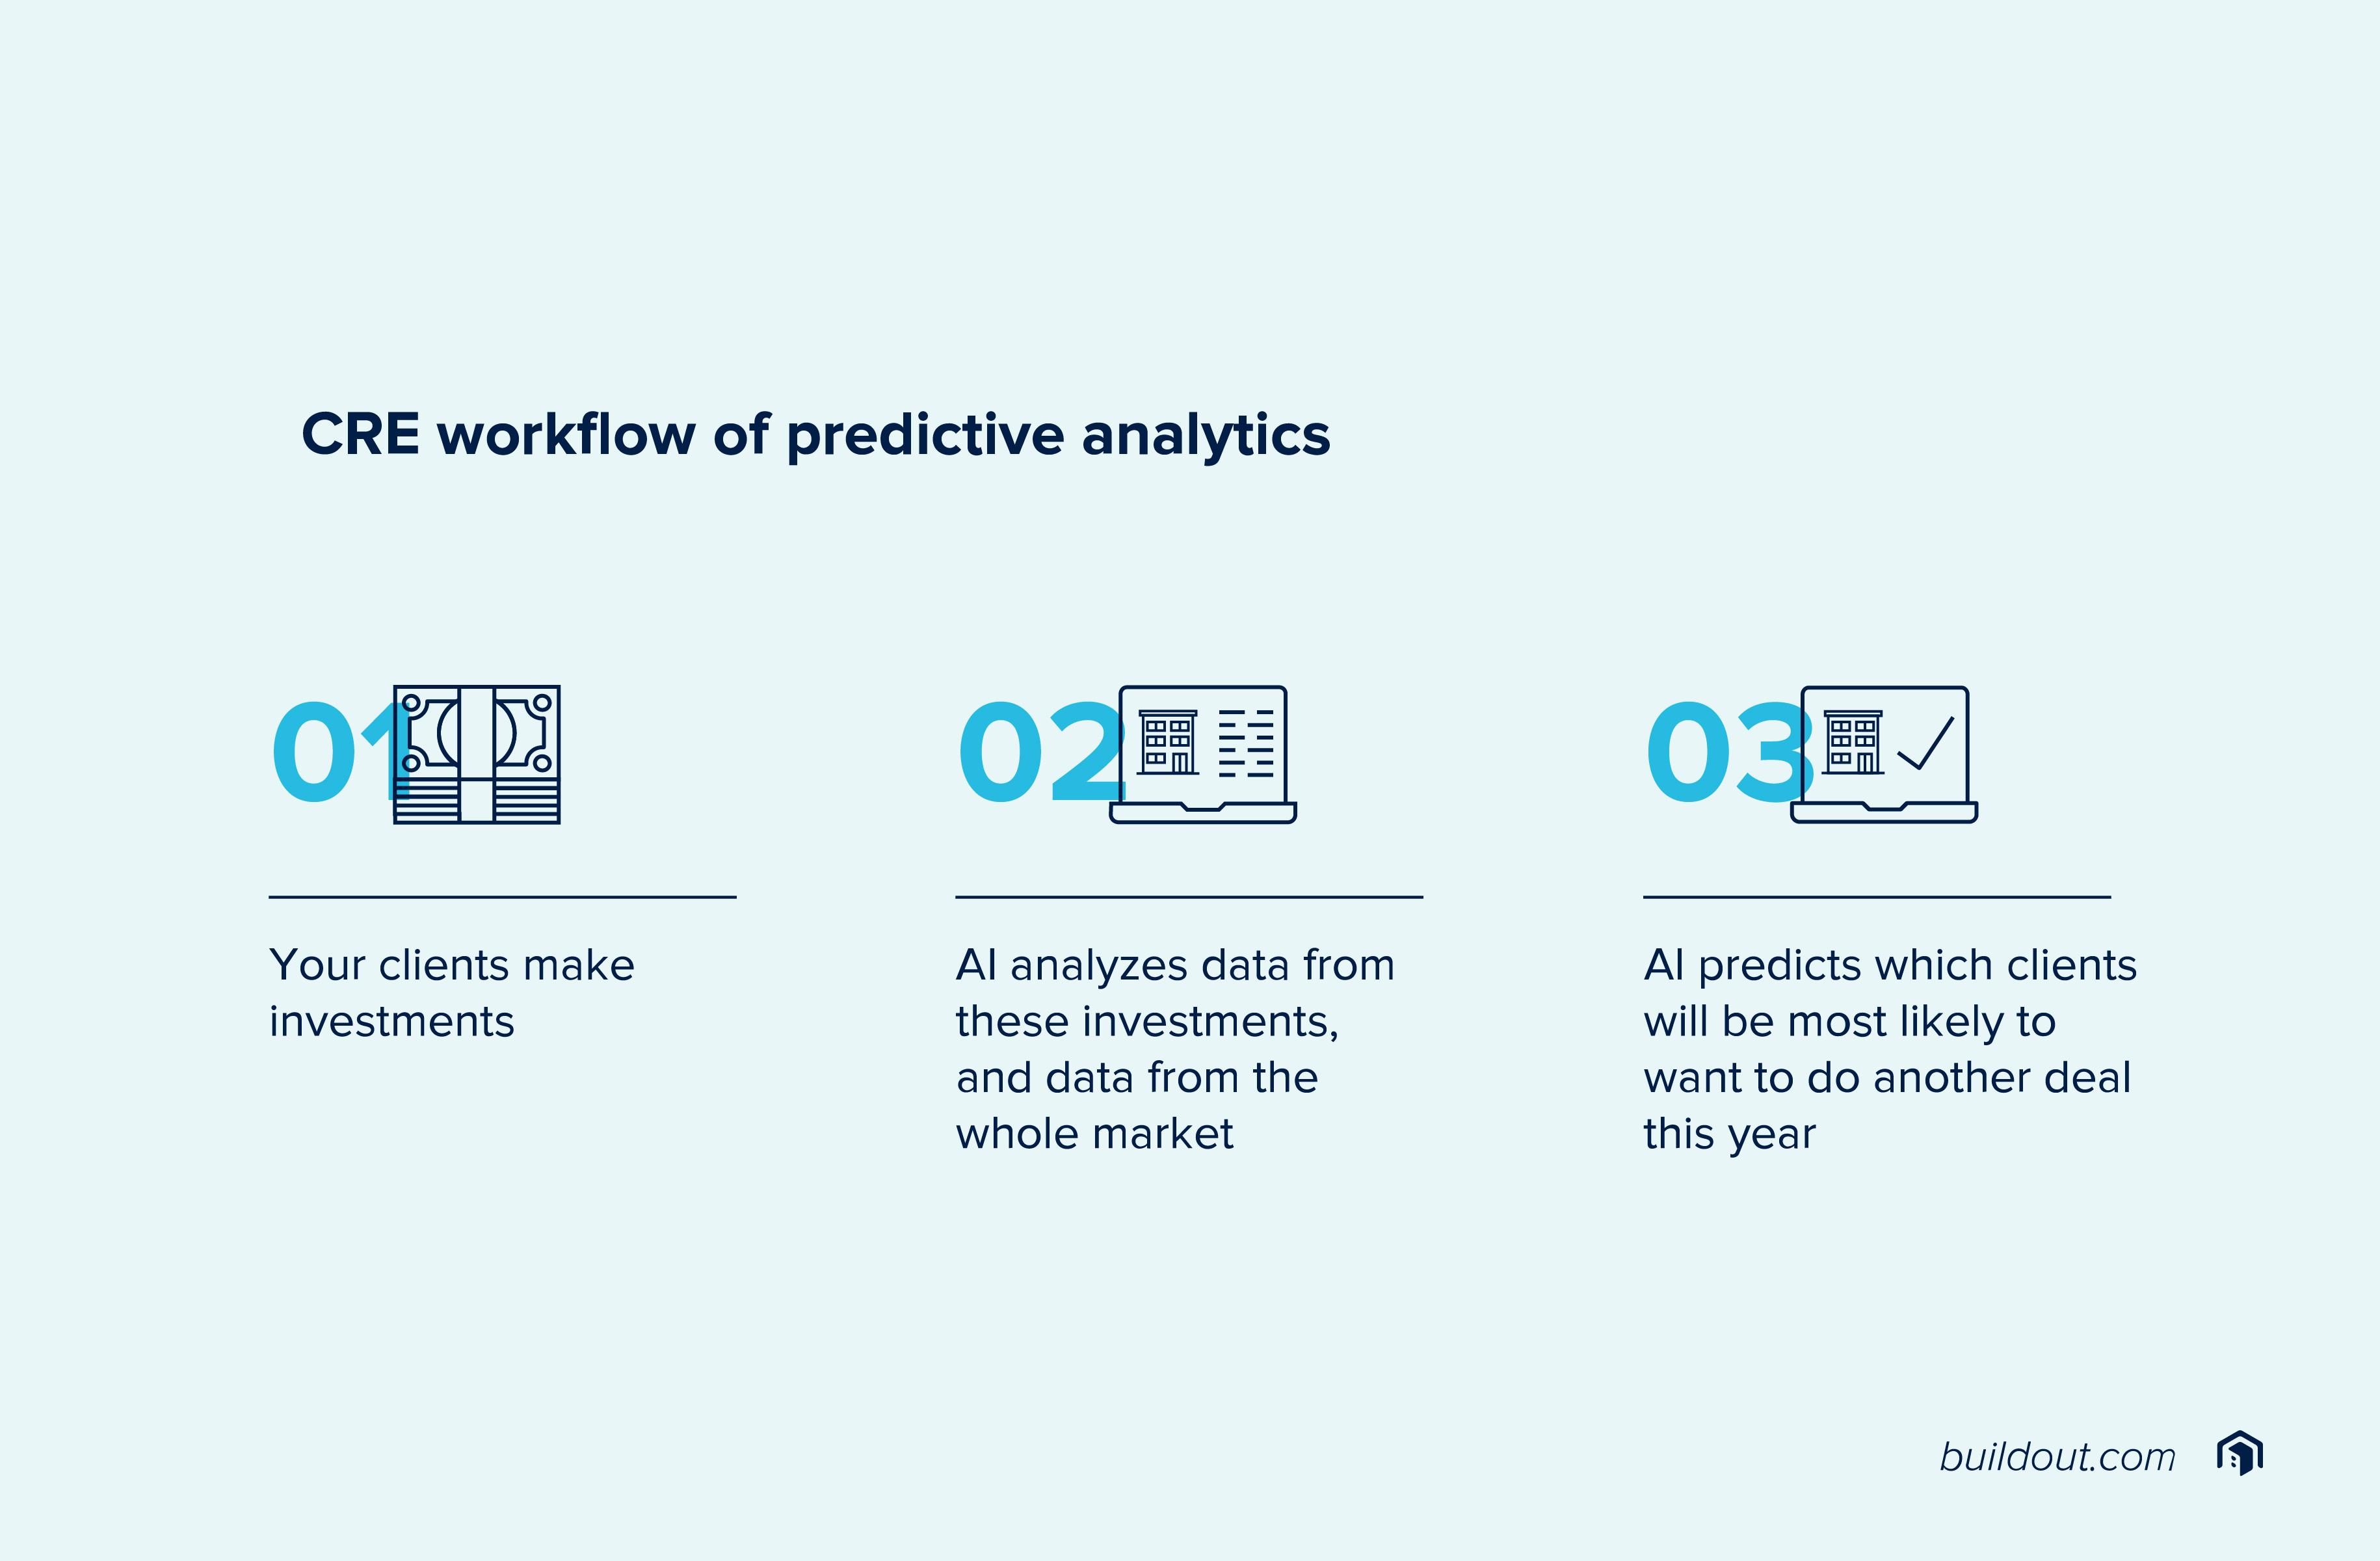 CRE workflow of predictive analytics